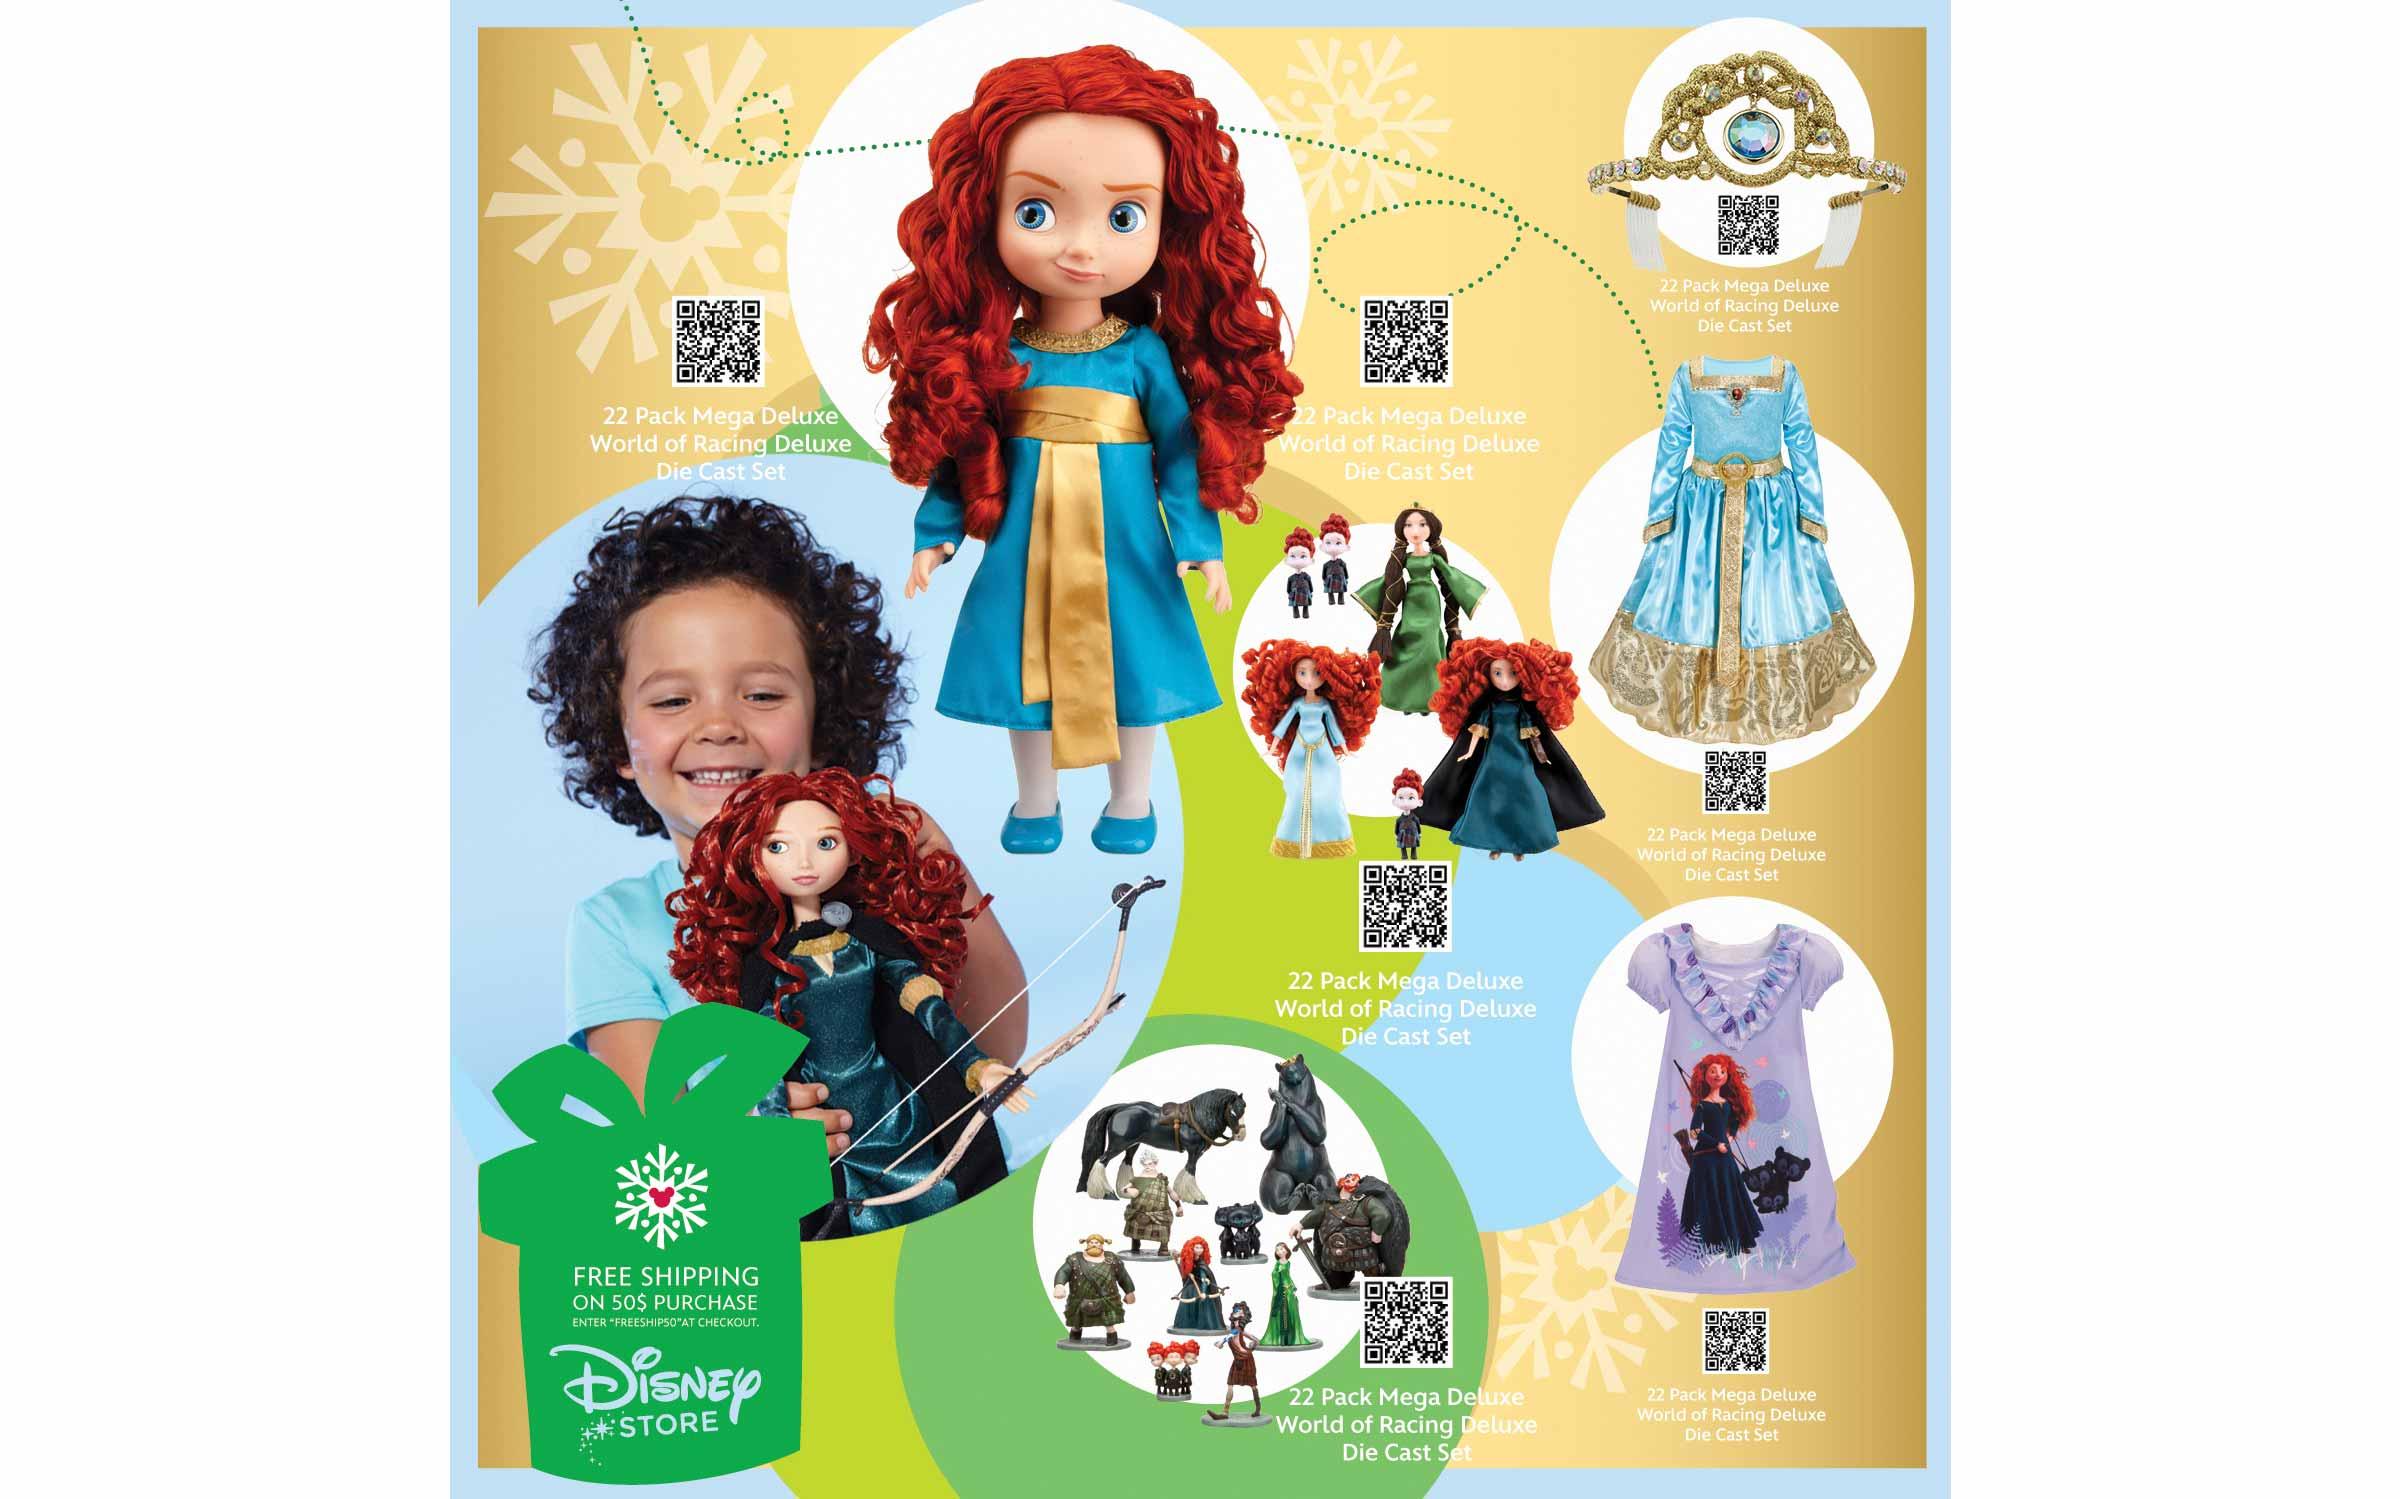 Disney Store North America Holiday Cube